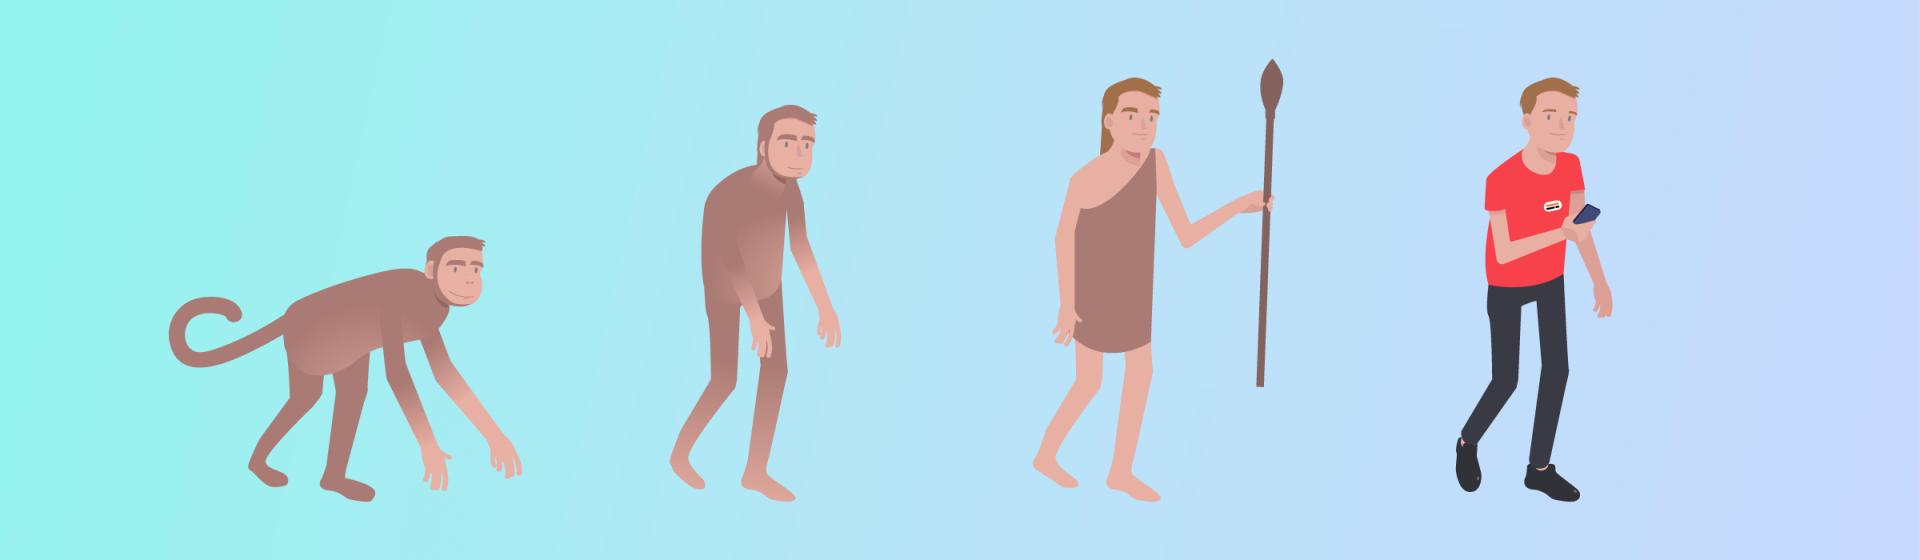 Emyspot evolution